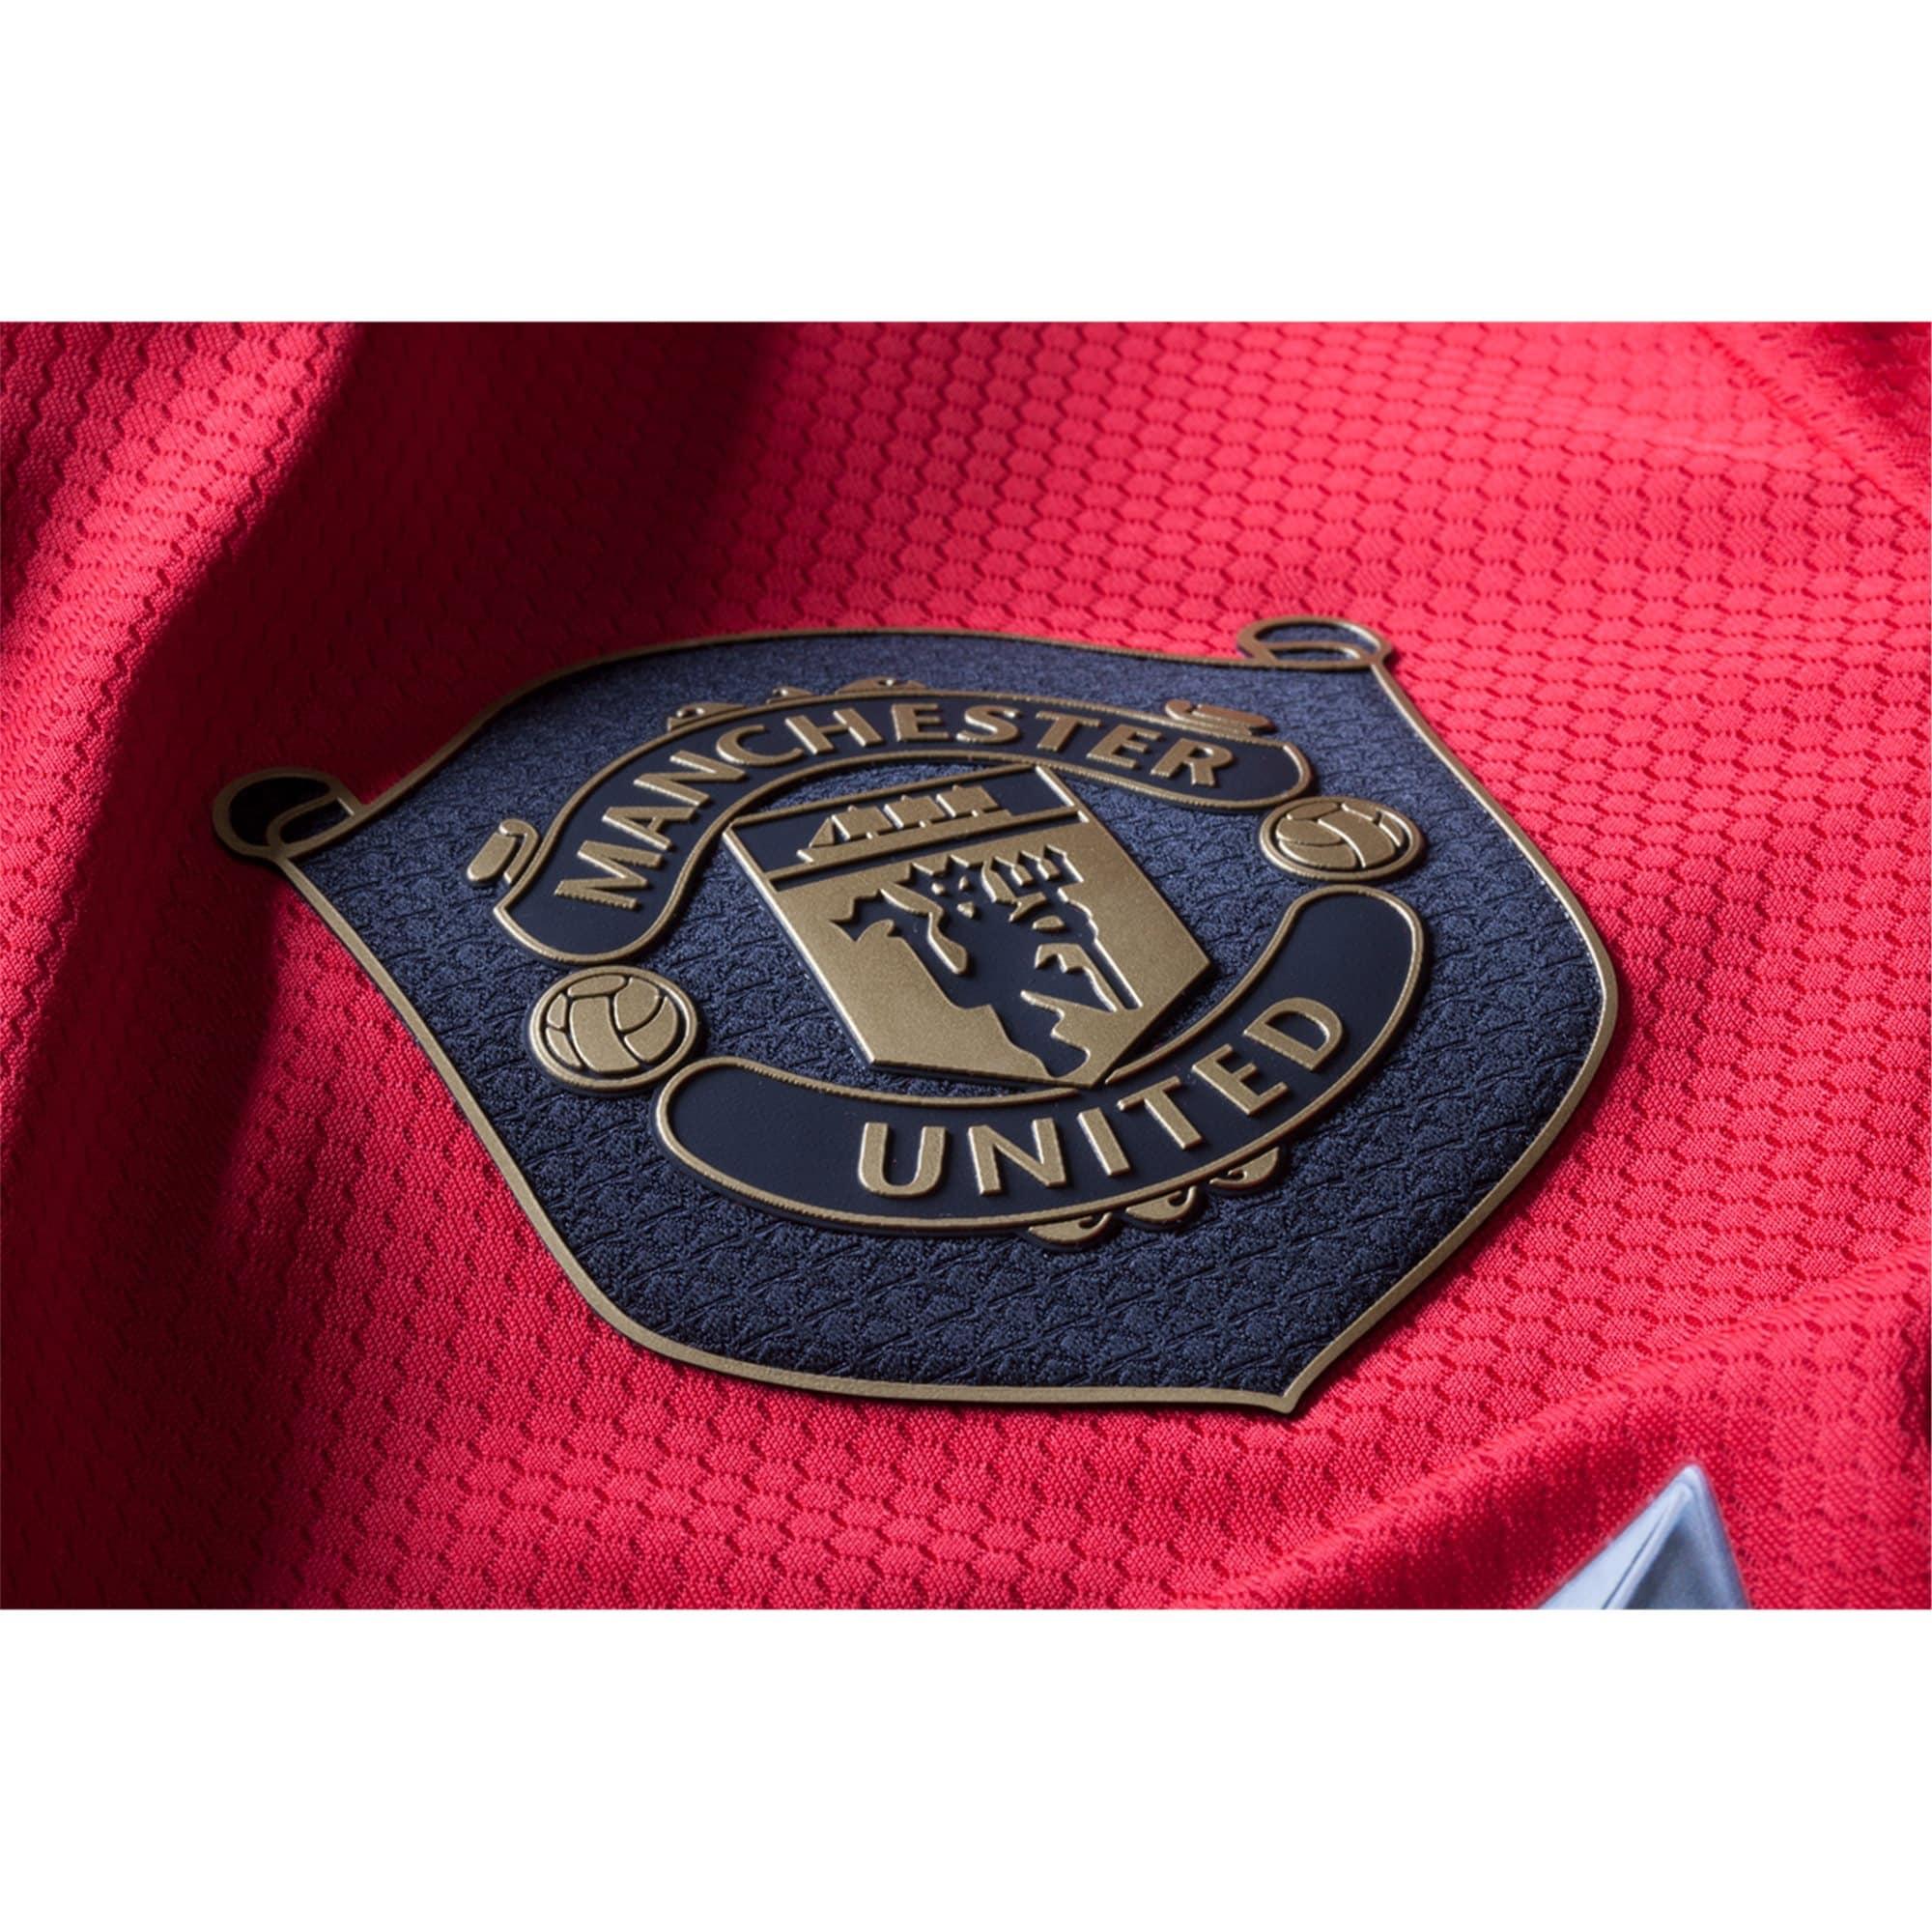 Manchester United Home Jersey 2019 Replica